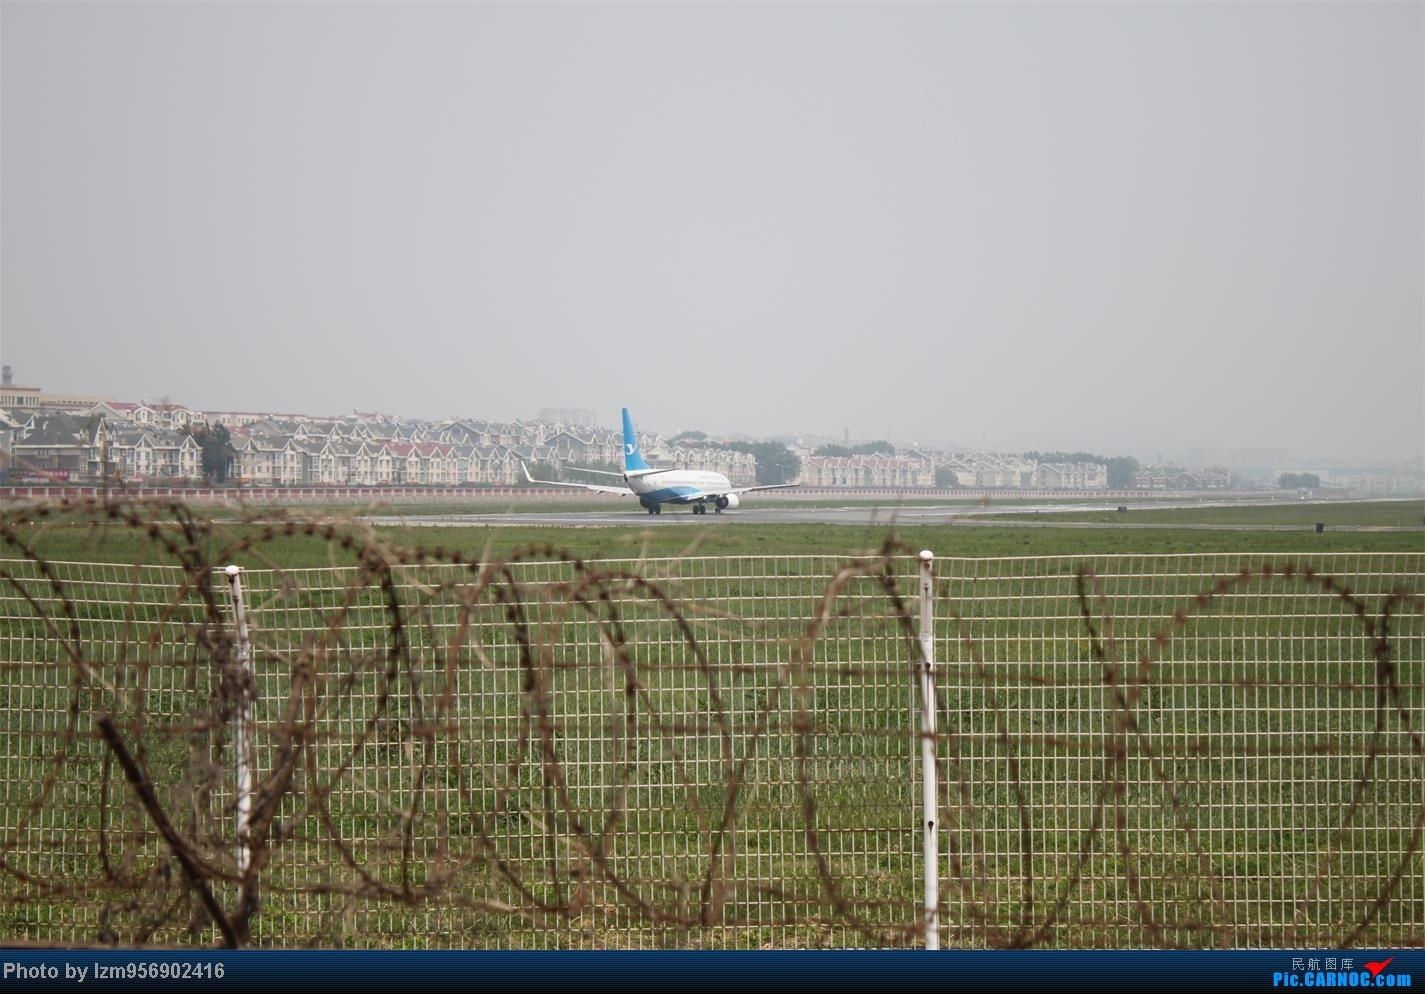 Re:[原创]DLC蹲点大半天,拍到了大棒航空772=w= BOEING 737-800 B-5162 中国大连周水子机场